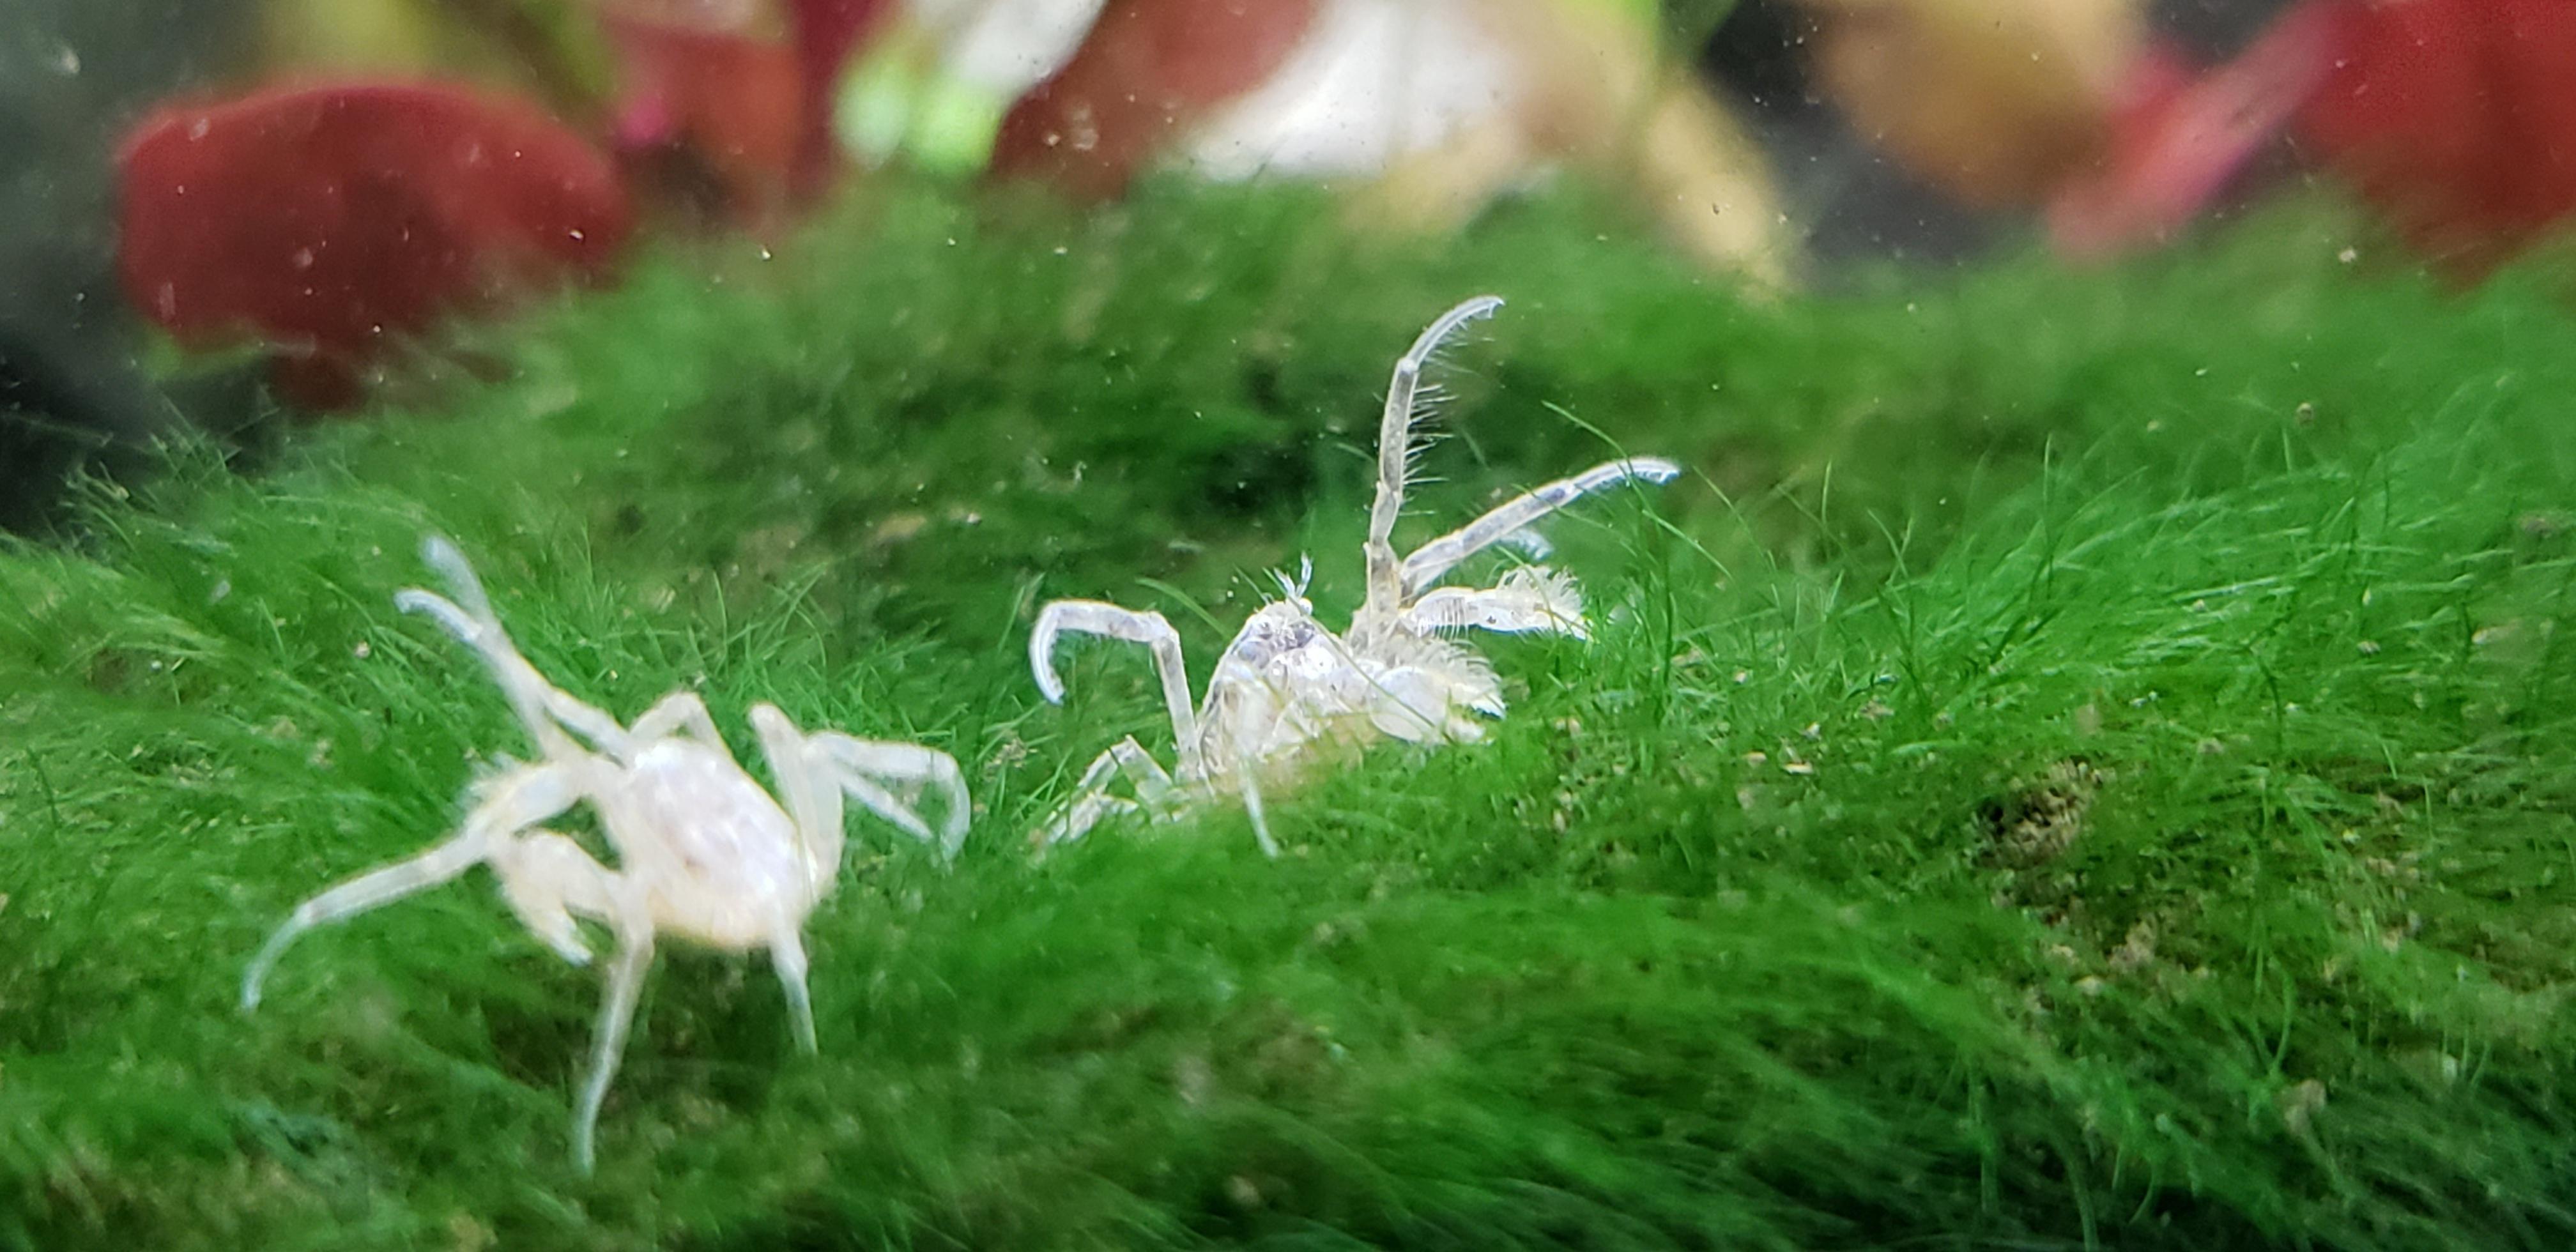 Thai Micro Crab Smallest Known Fully Aquatic Freshwater Crab In 2020 Growing Organic Food Grow Organic Organic Plants